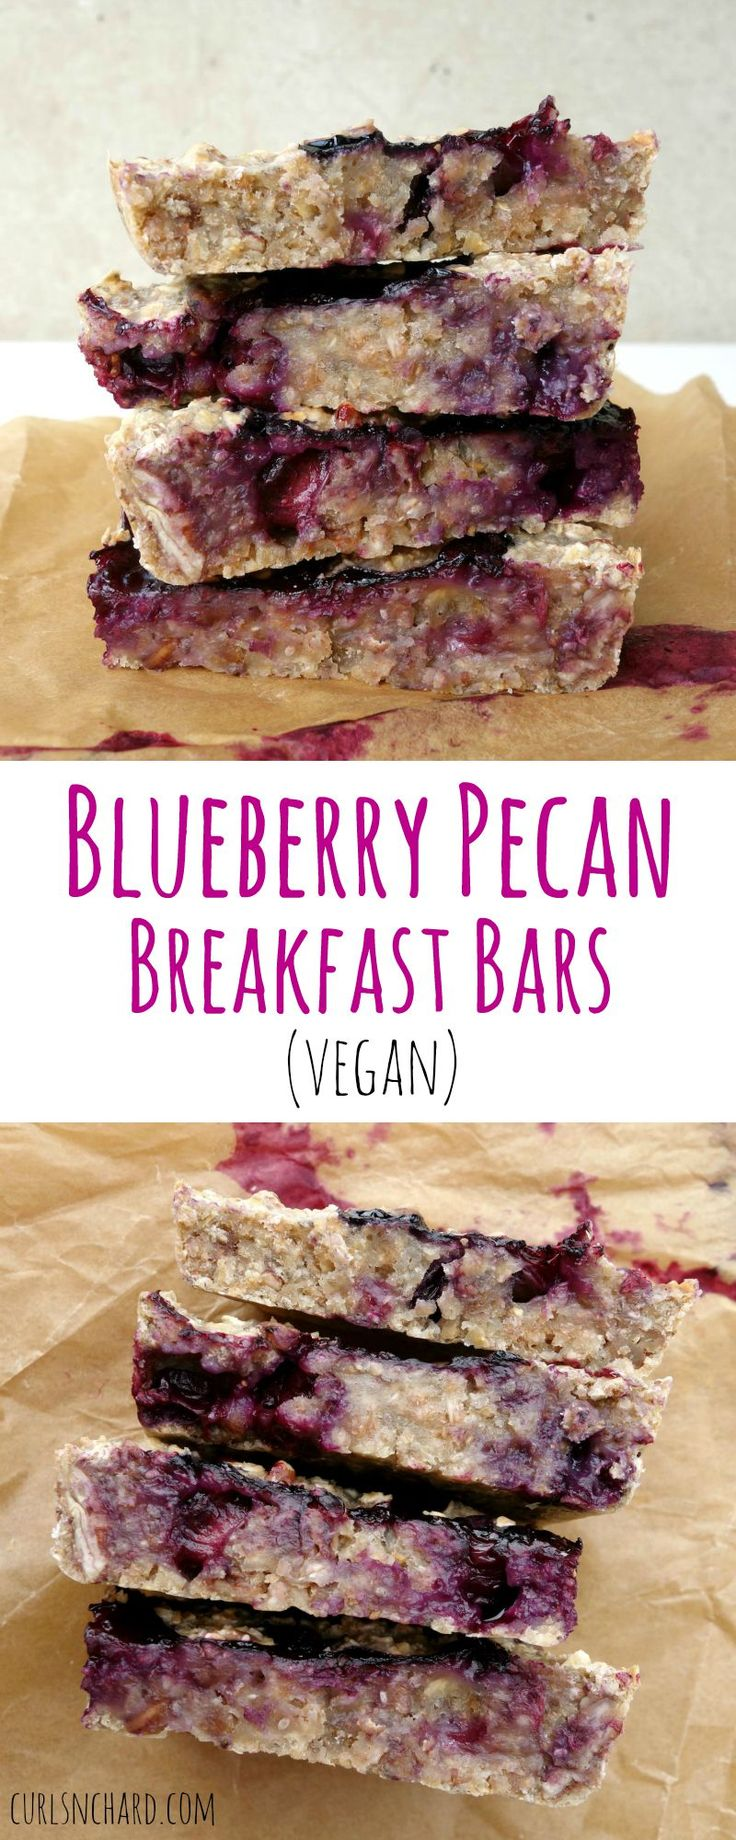 Blueberry Pecan Breakfast Bars made with Spelt Flour (vegan) | curlsnchard.com